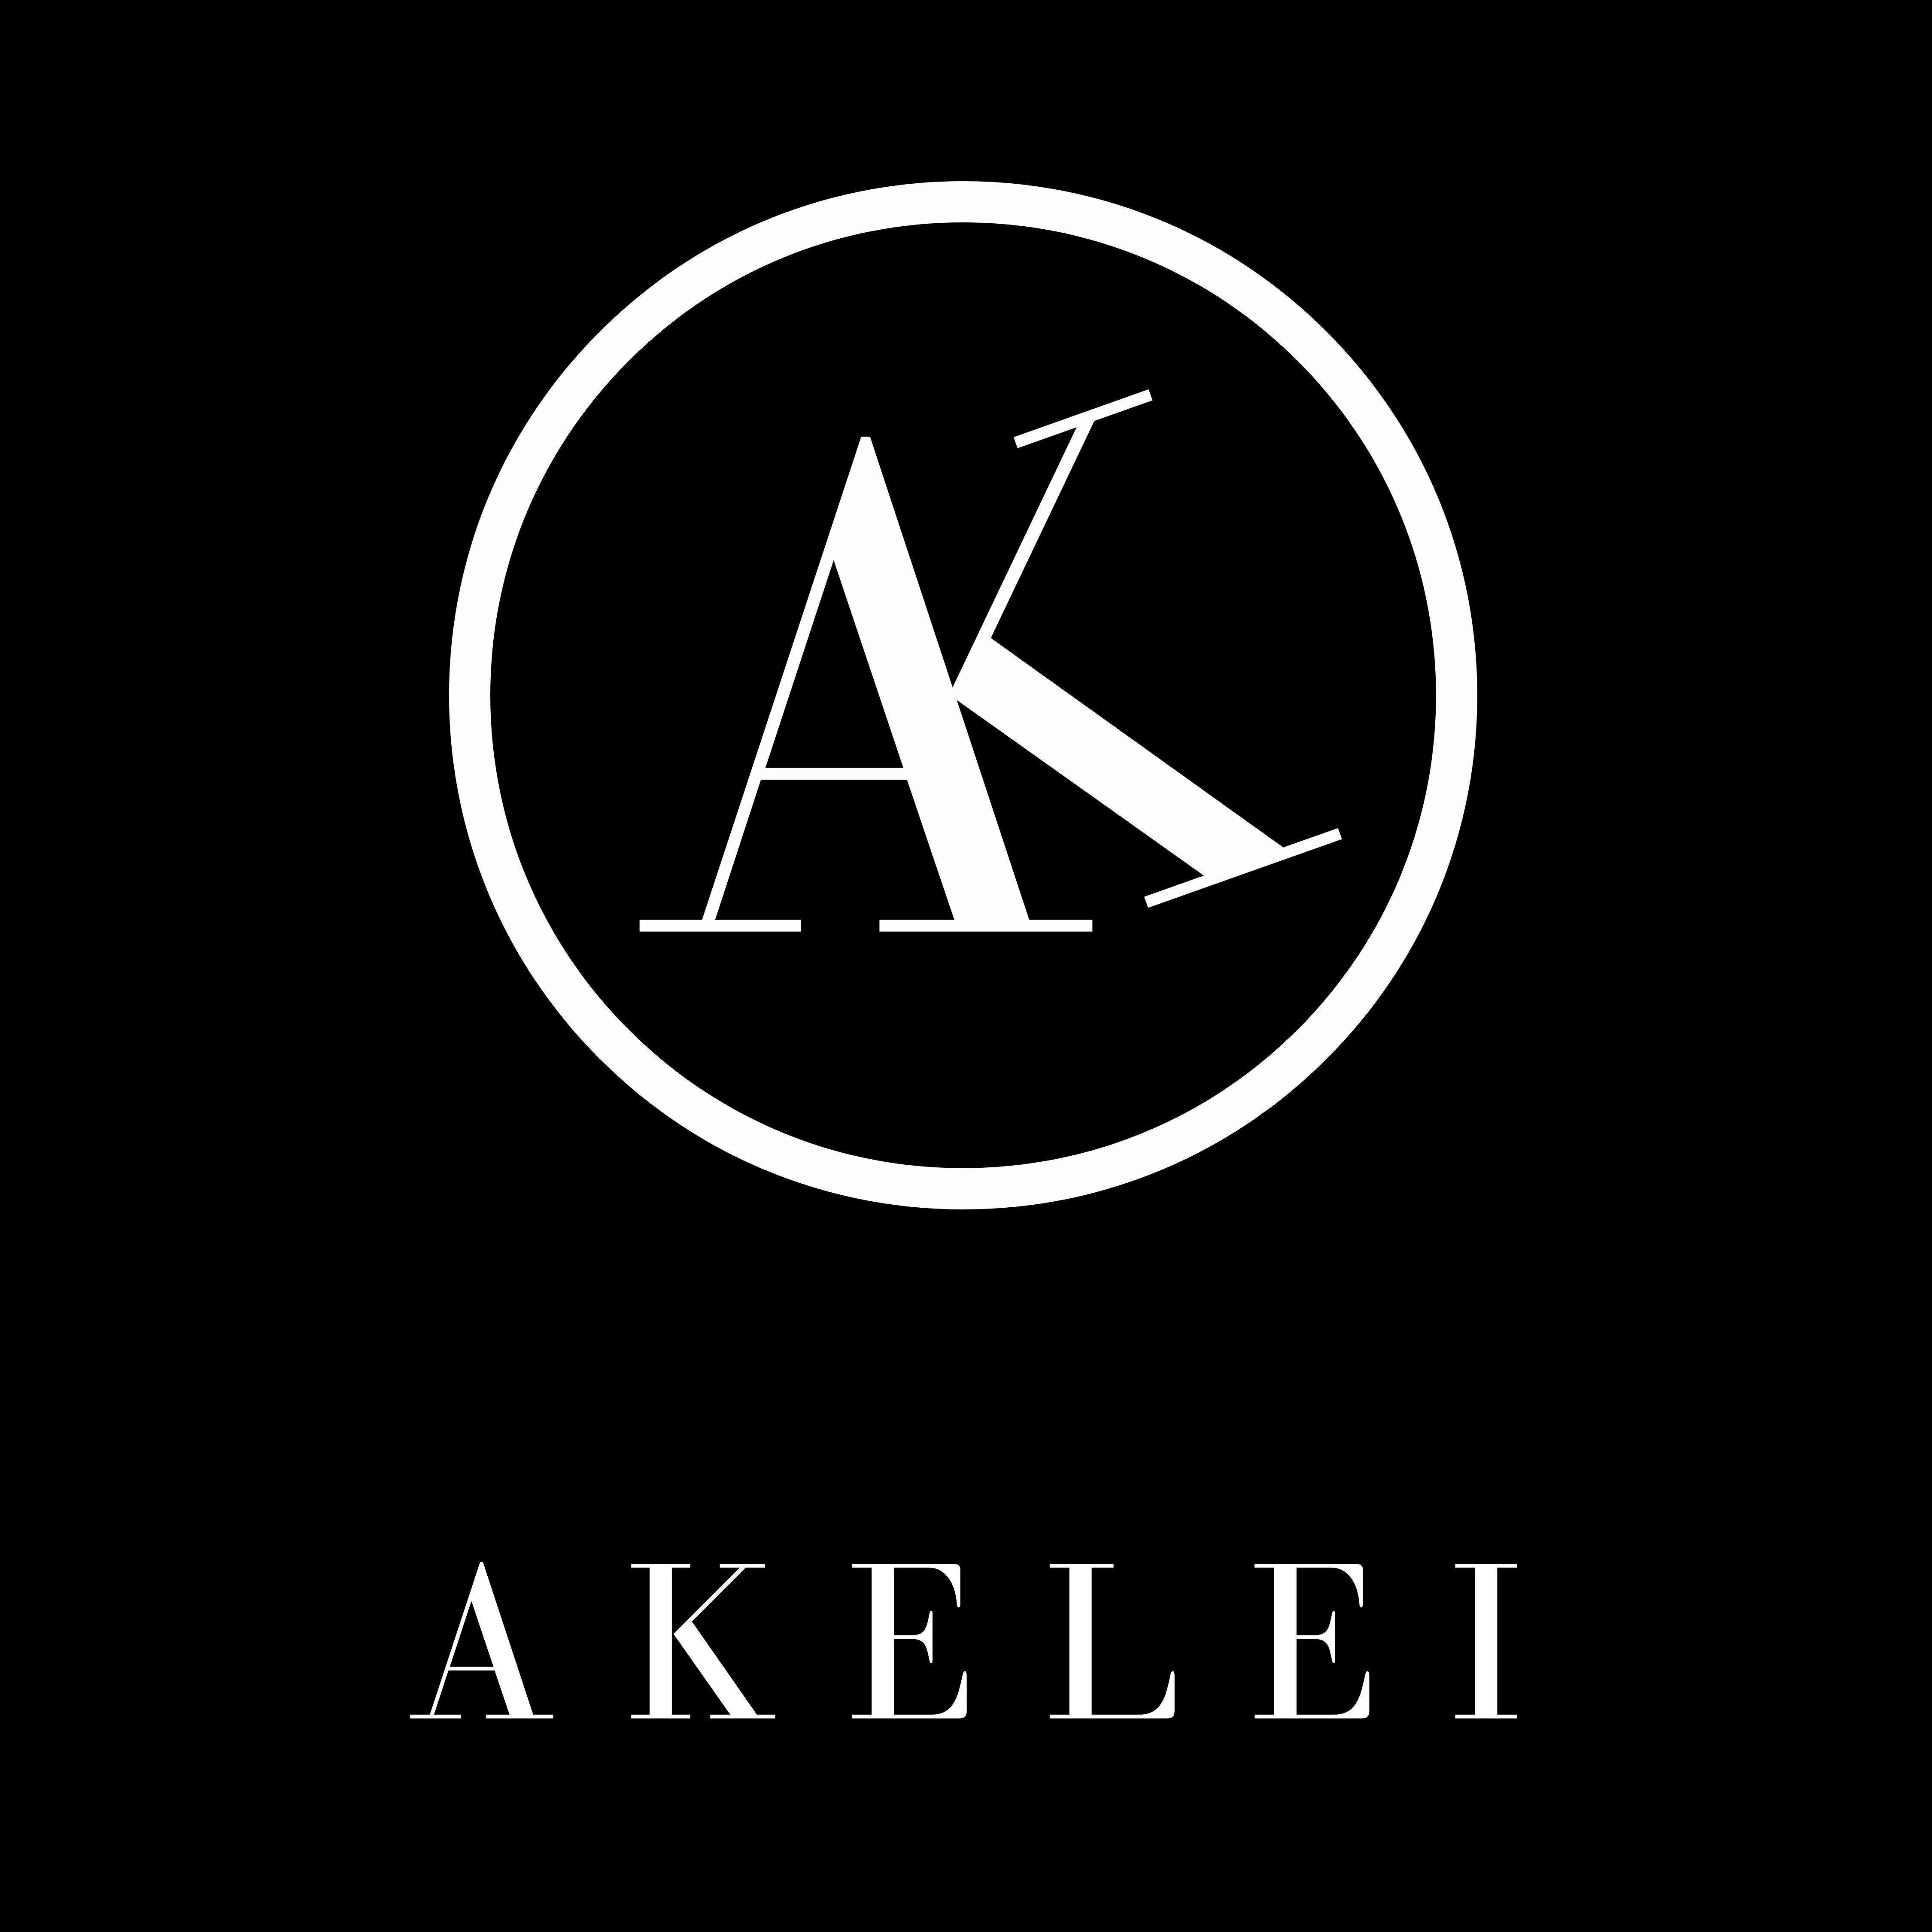 Akelei Manufacture